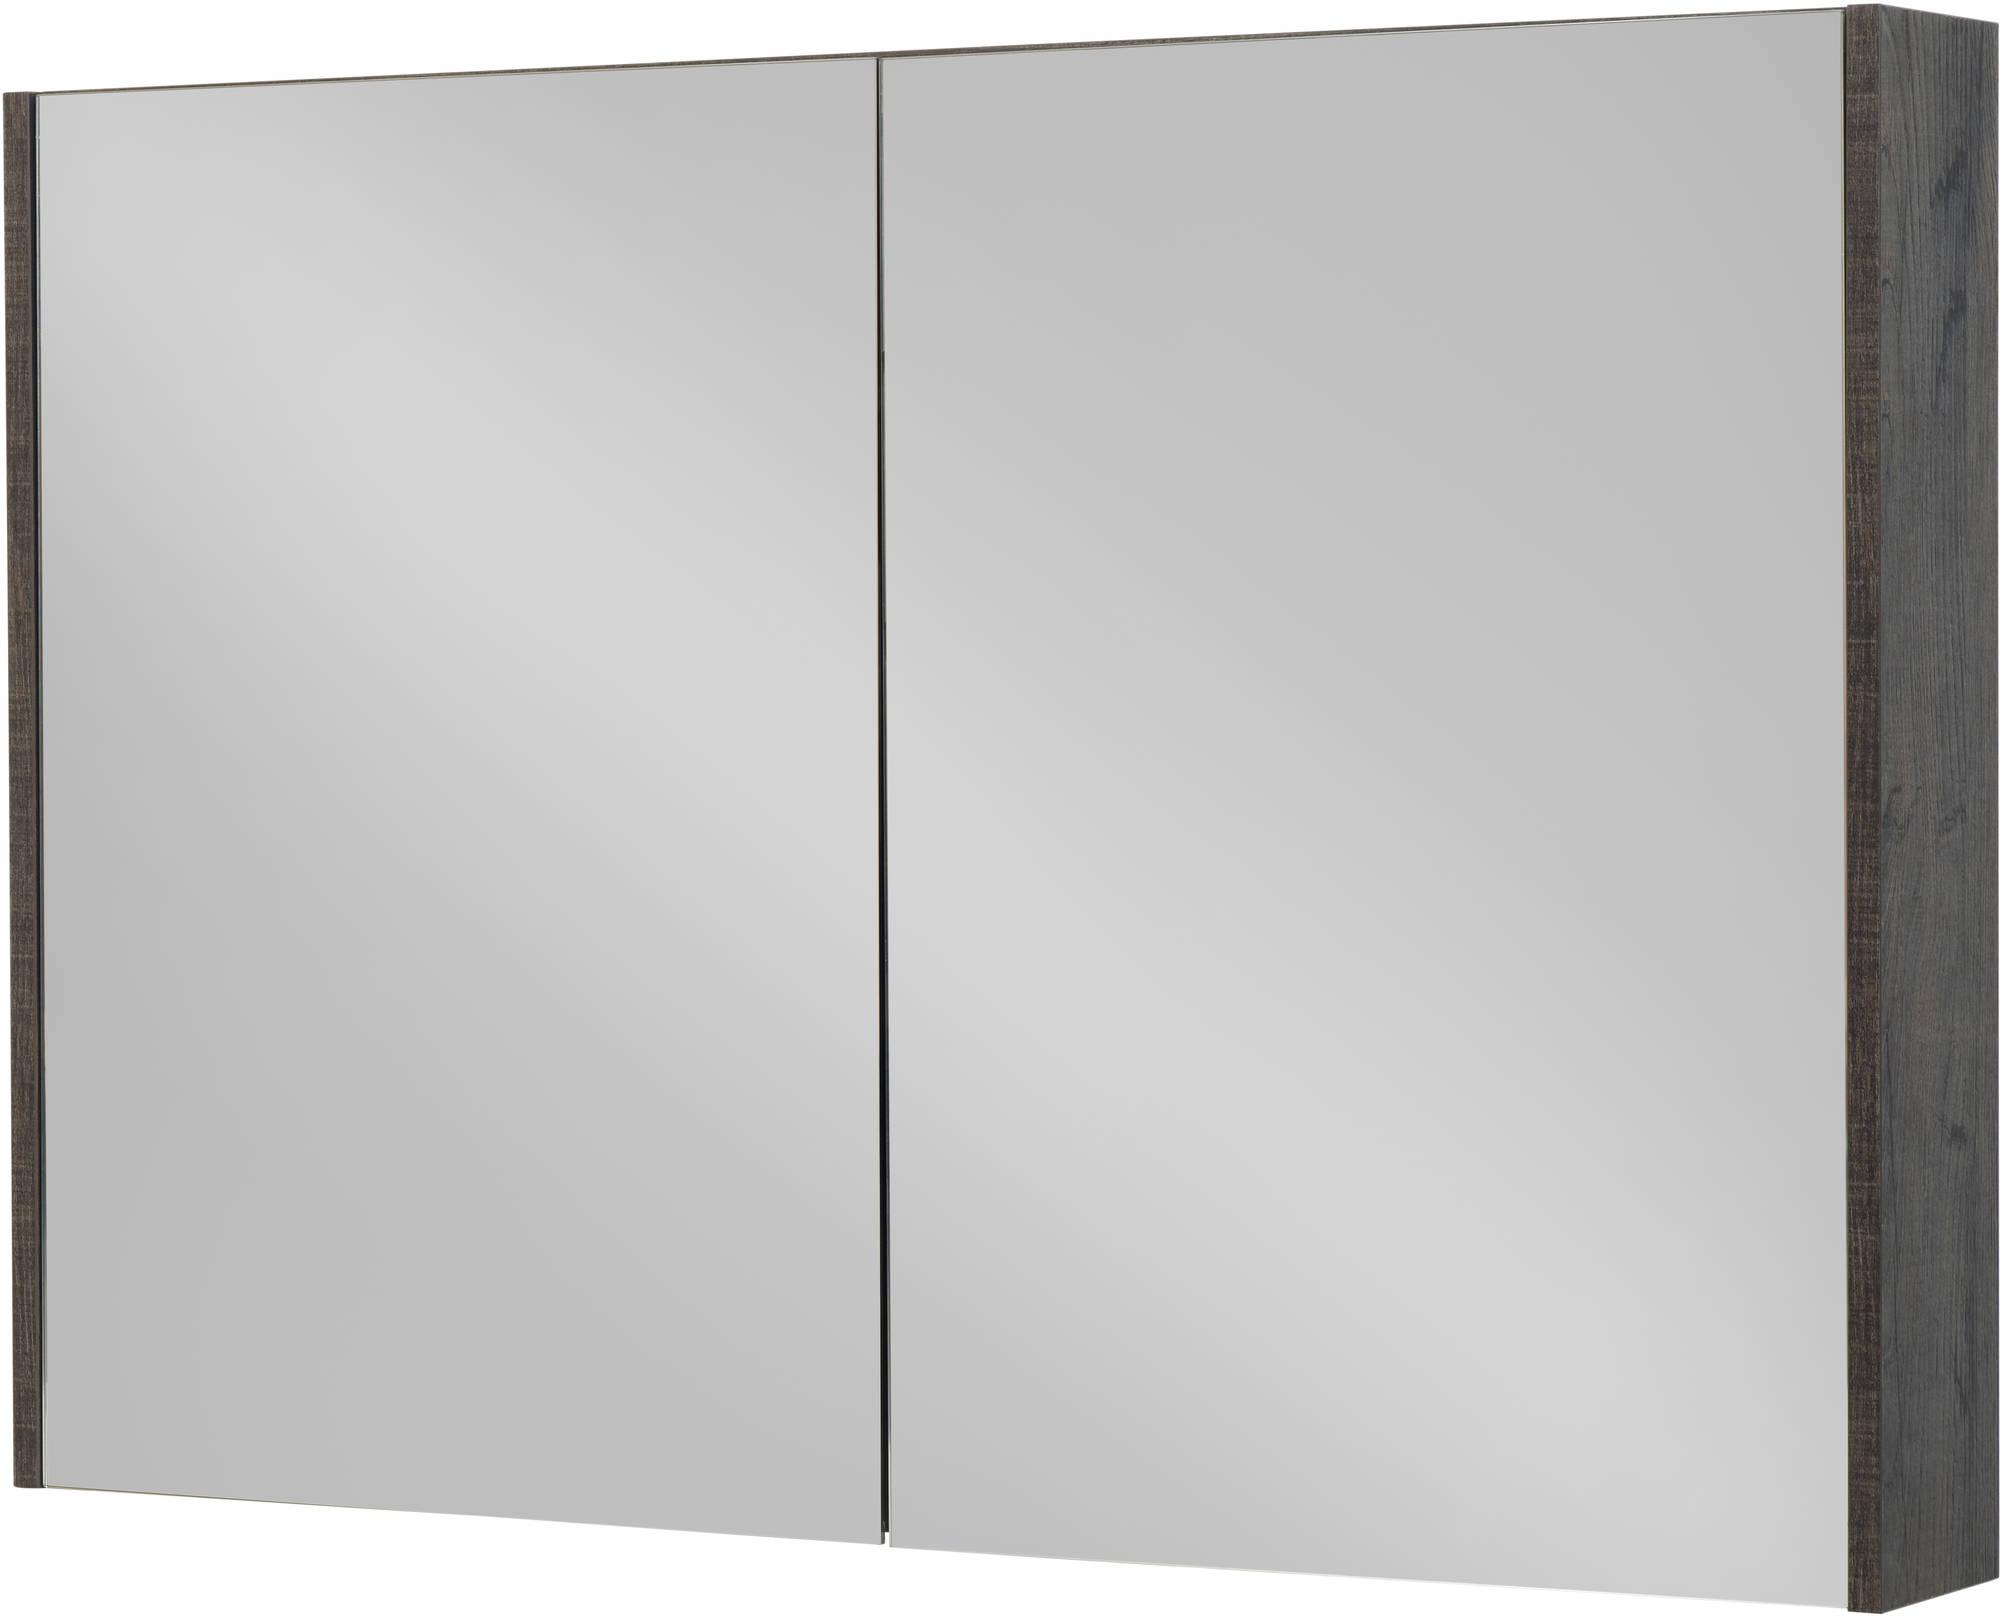 Saniselect Socan Spiegelkast 120x14x70 cm Kasteel Bruin